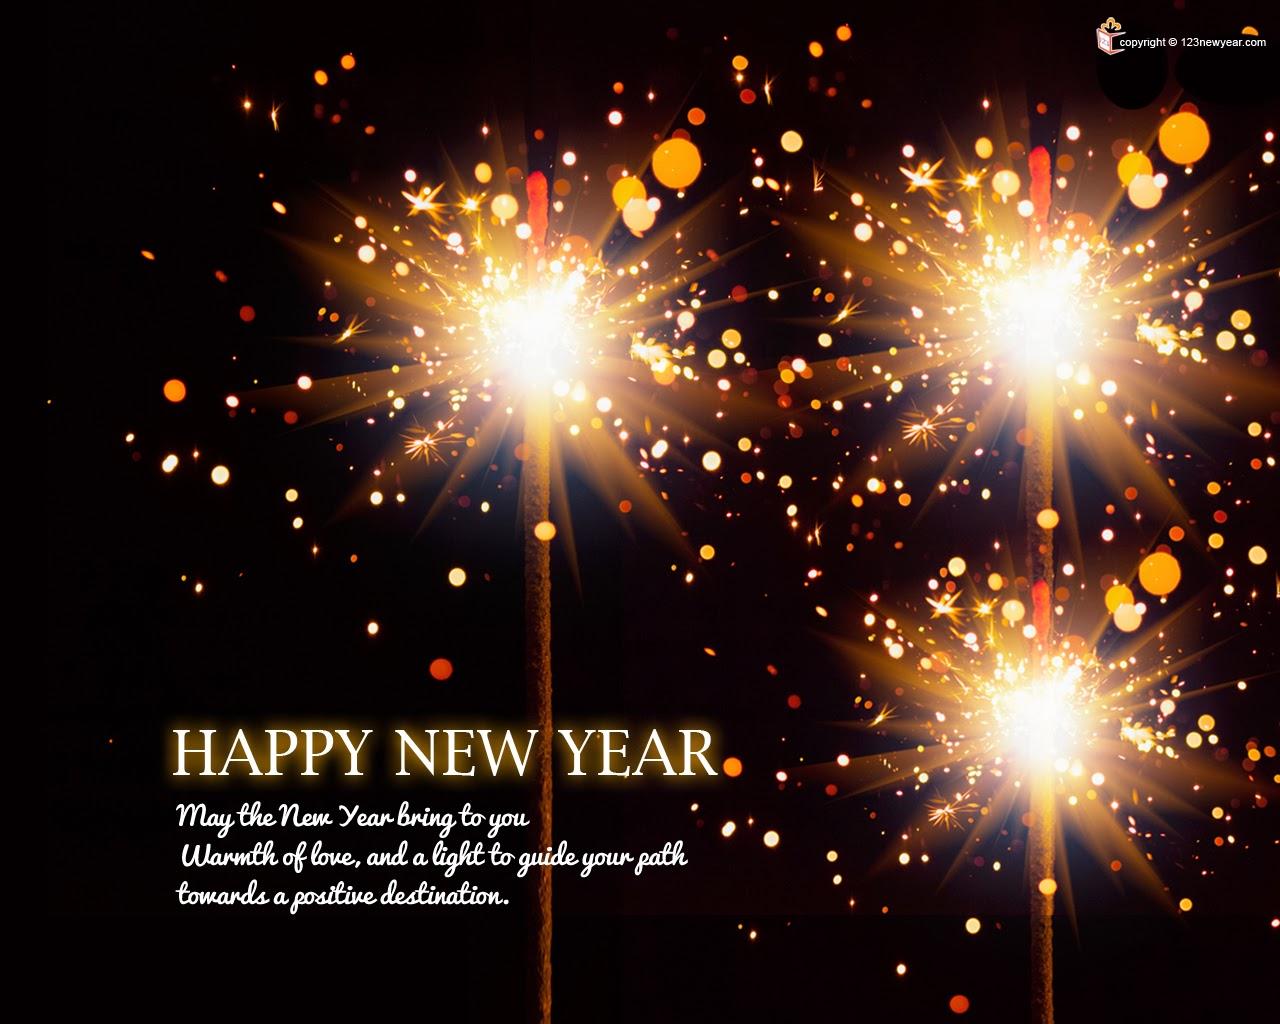 gambar ucapan tahun baru 2014 keren